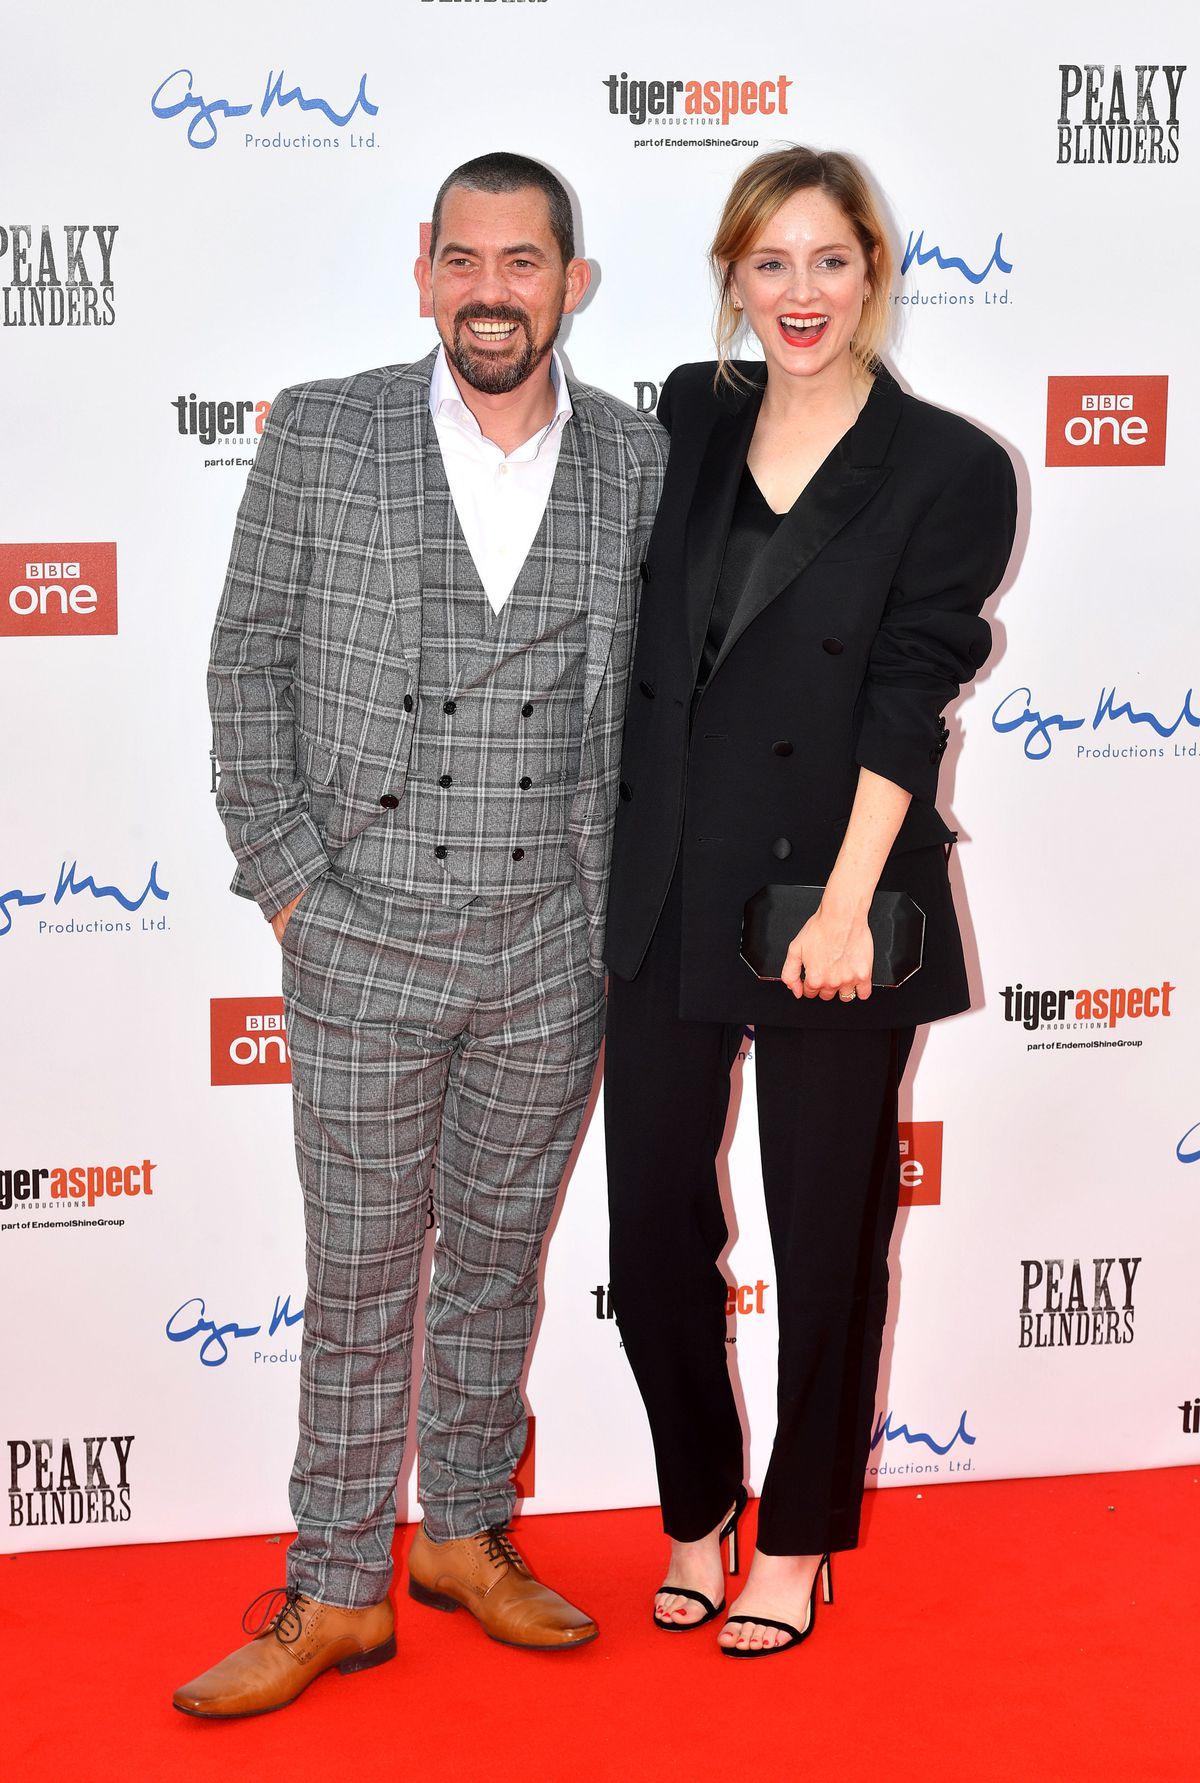 Packy Lee and Sophie Rundle attending the Peaky Blinders Series Five World Premiere held at Birmingham Town Hall